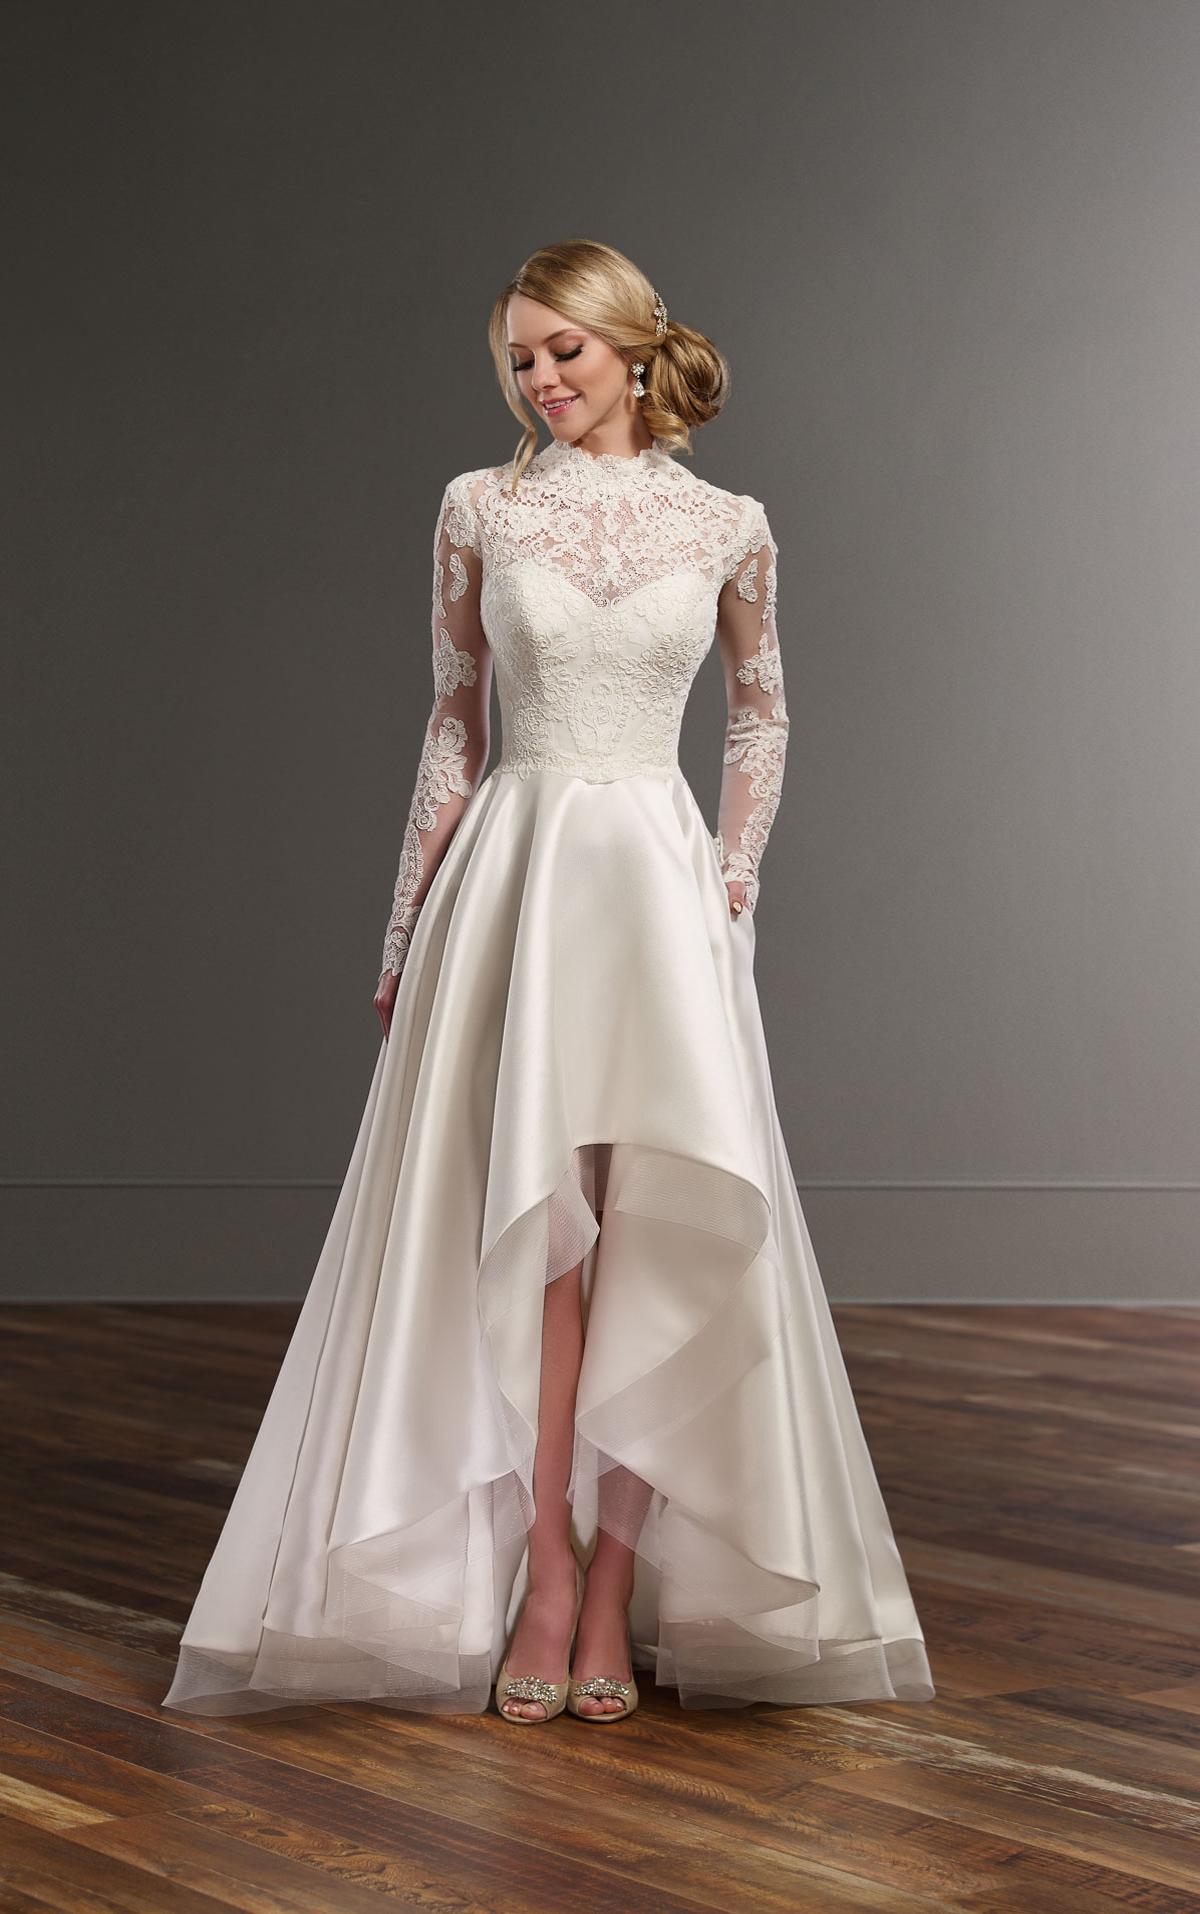 essences wedding dresses photo - 1